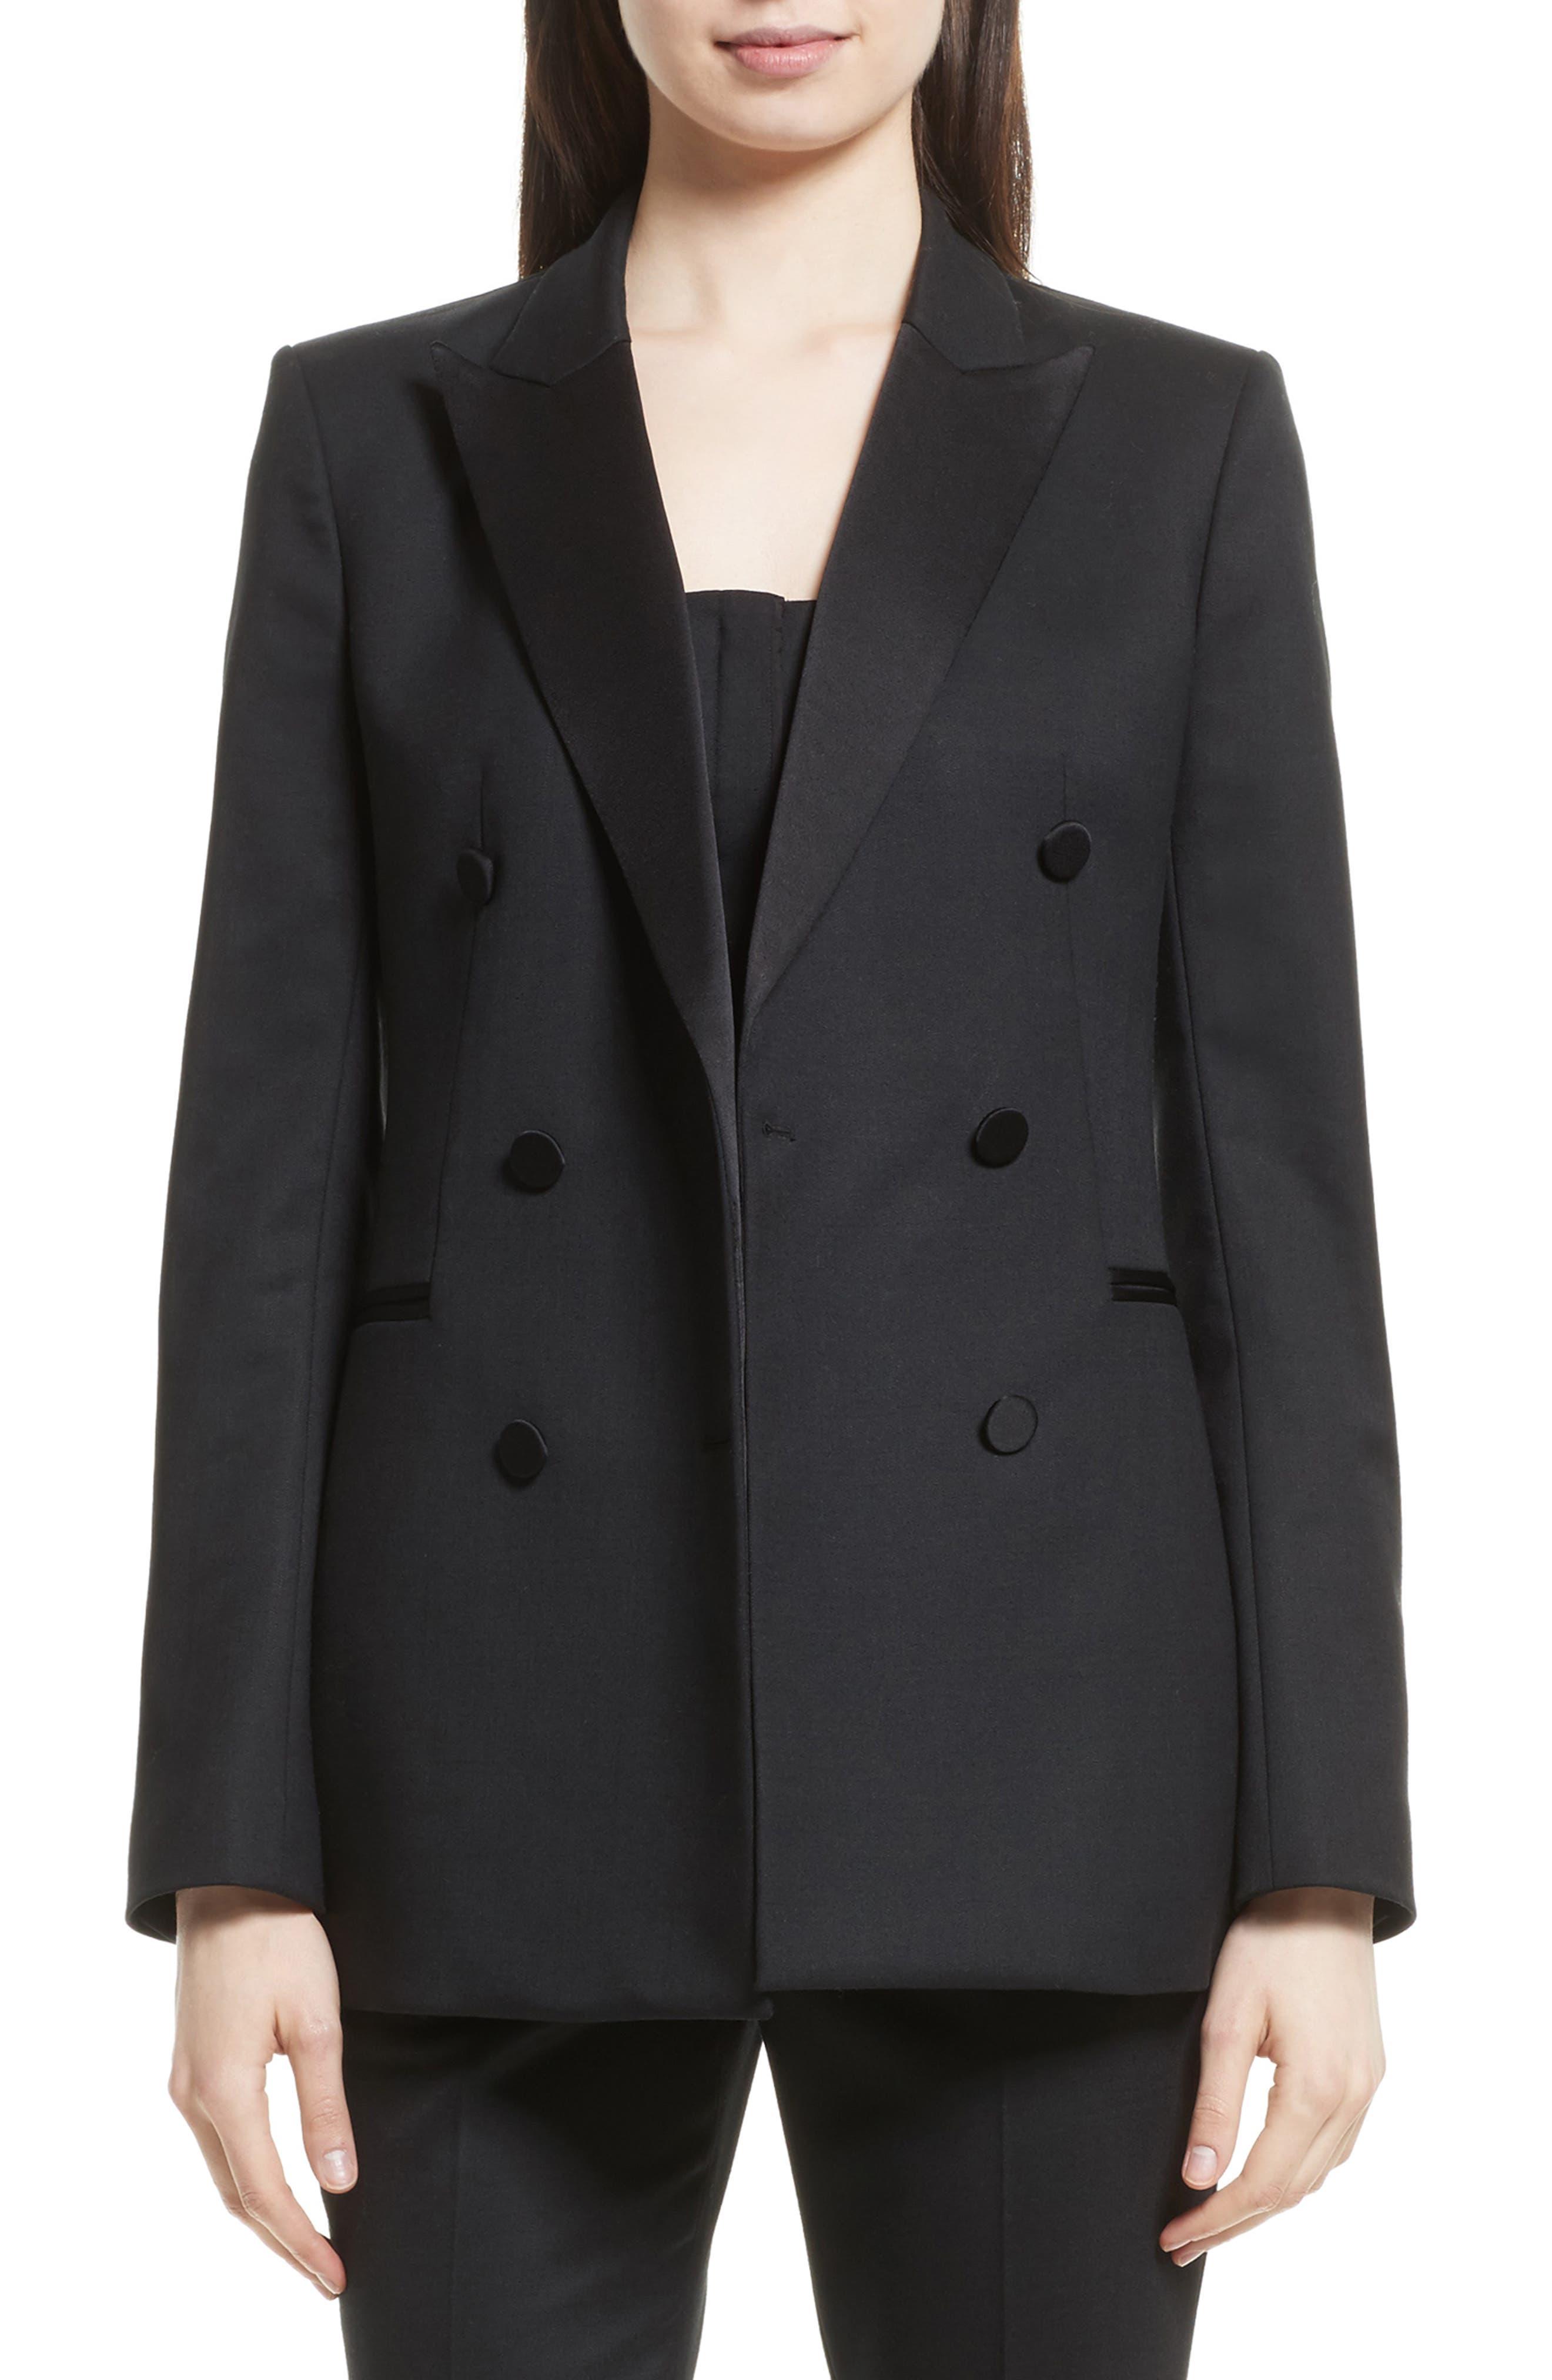 Wool Blend Tuxedo Jacket,                         Main,                         color, Black